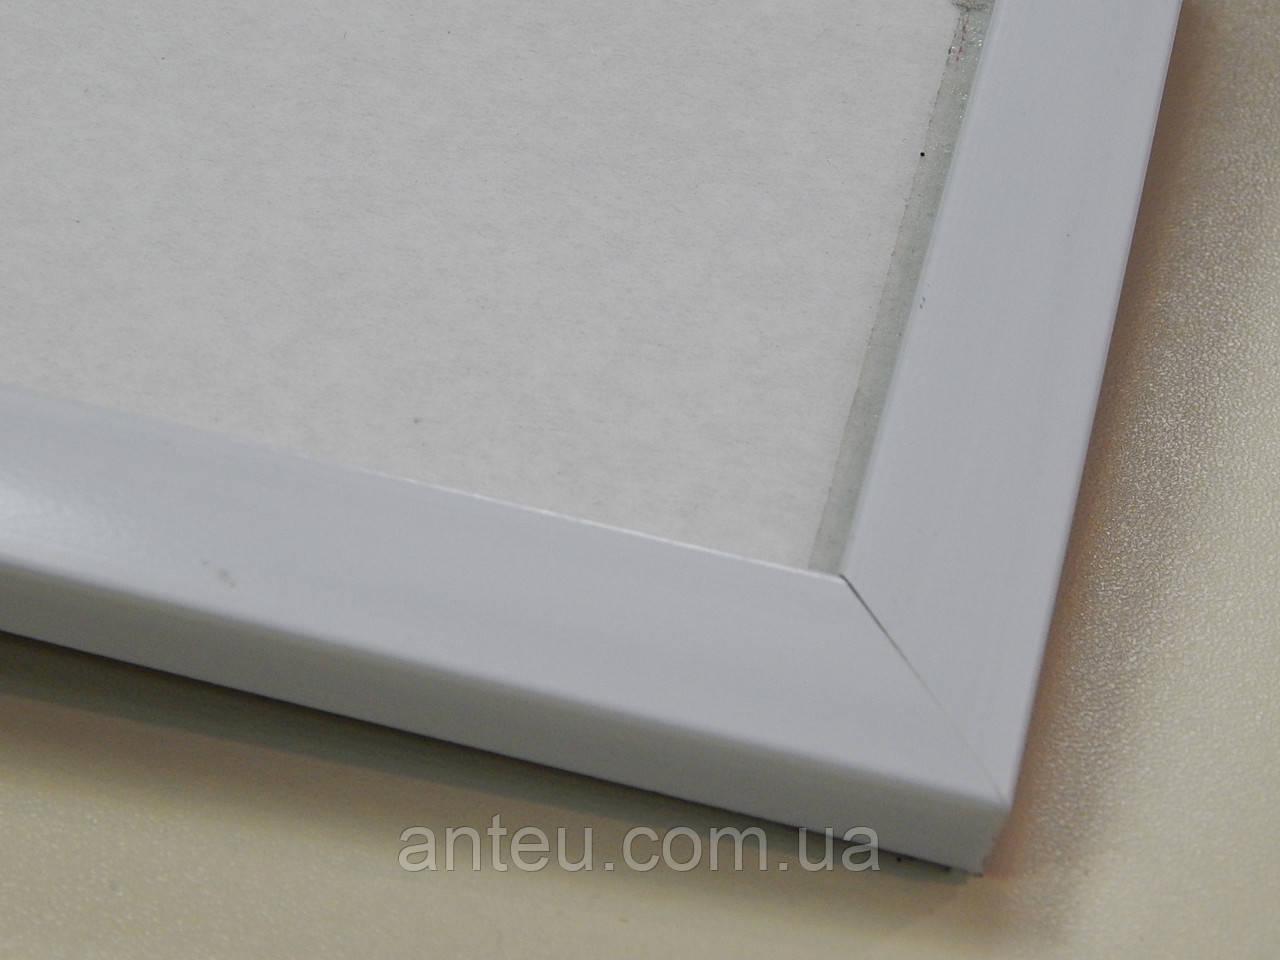 Рамка 30х40.Профиль 16 мм.Белый.